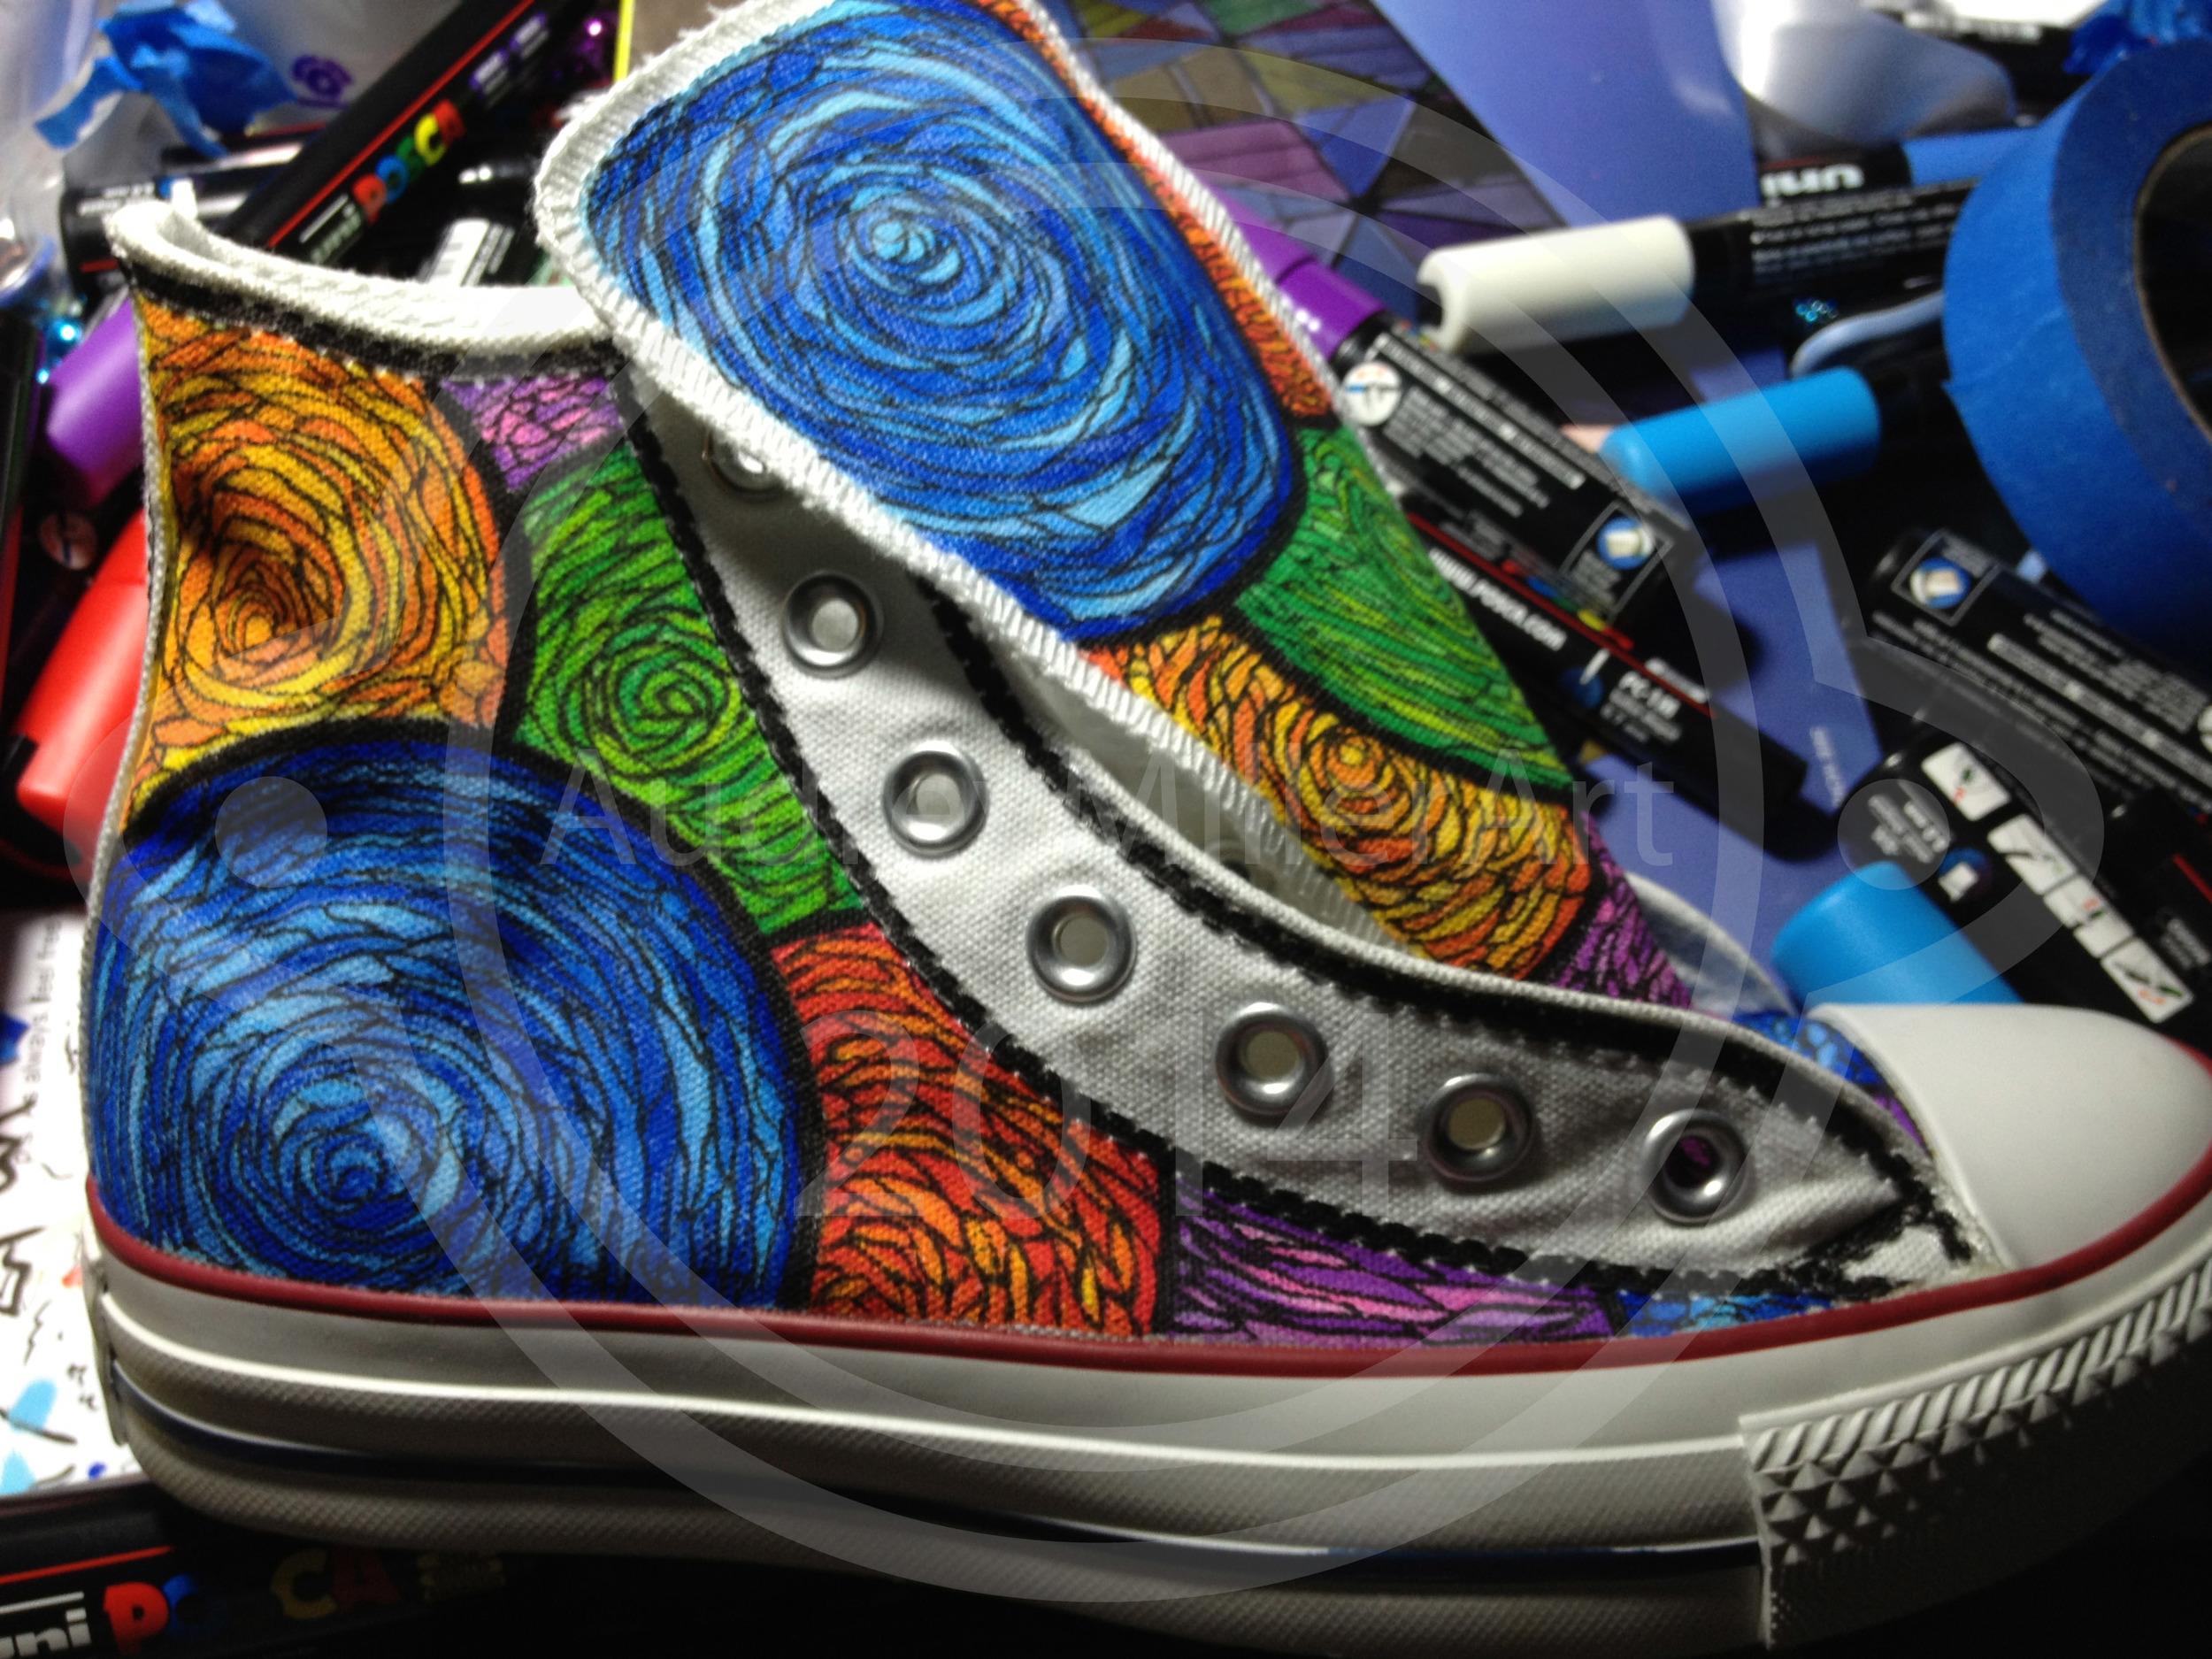 color shoe.jpg